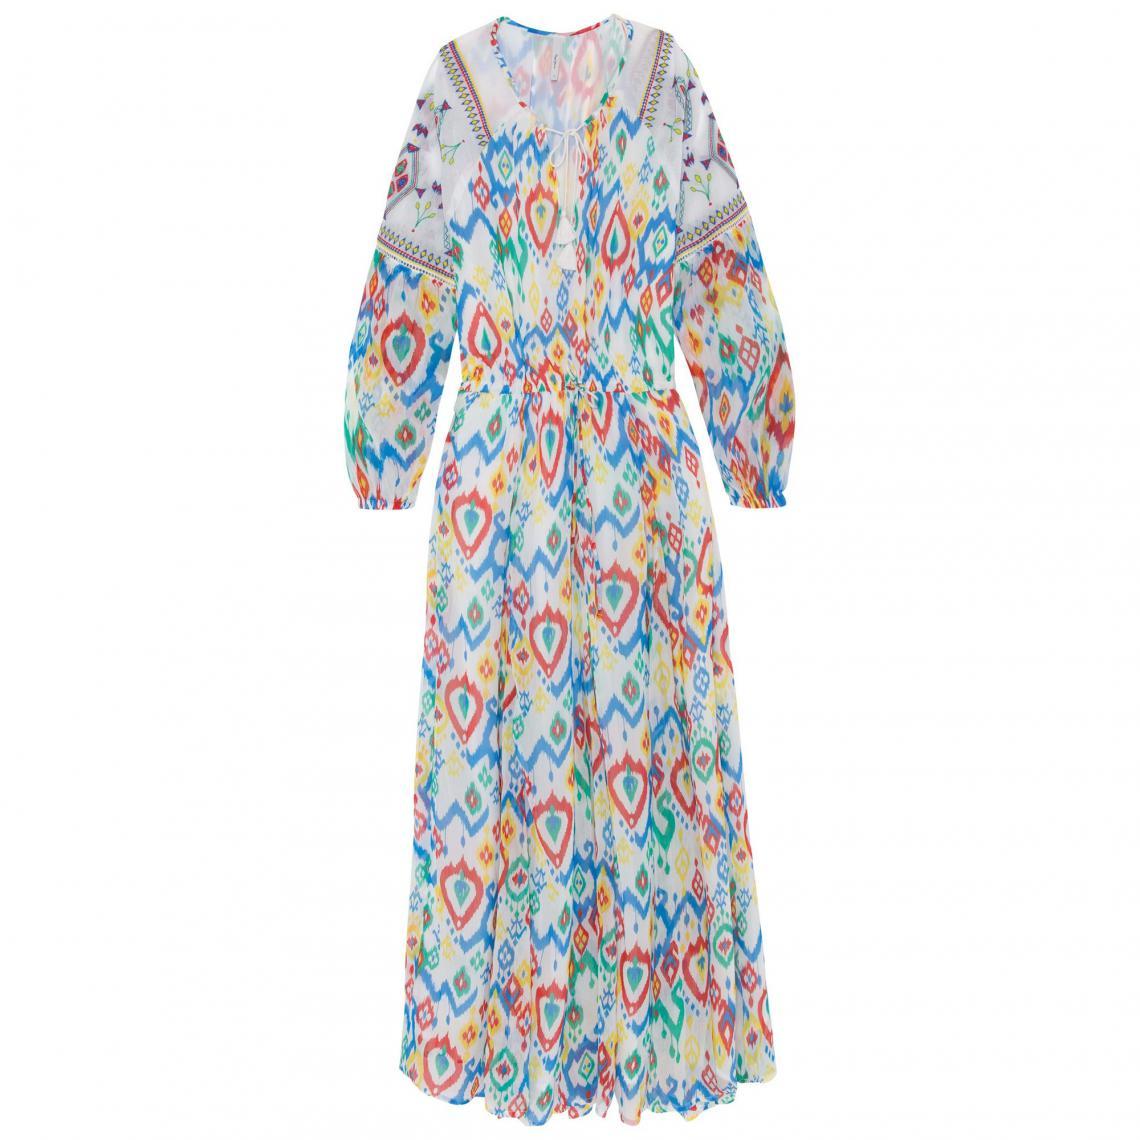 Longues Manches Femme Robe Longue Pepe Suisses Jeans Multicolore3 TKlF13Jc